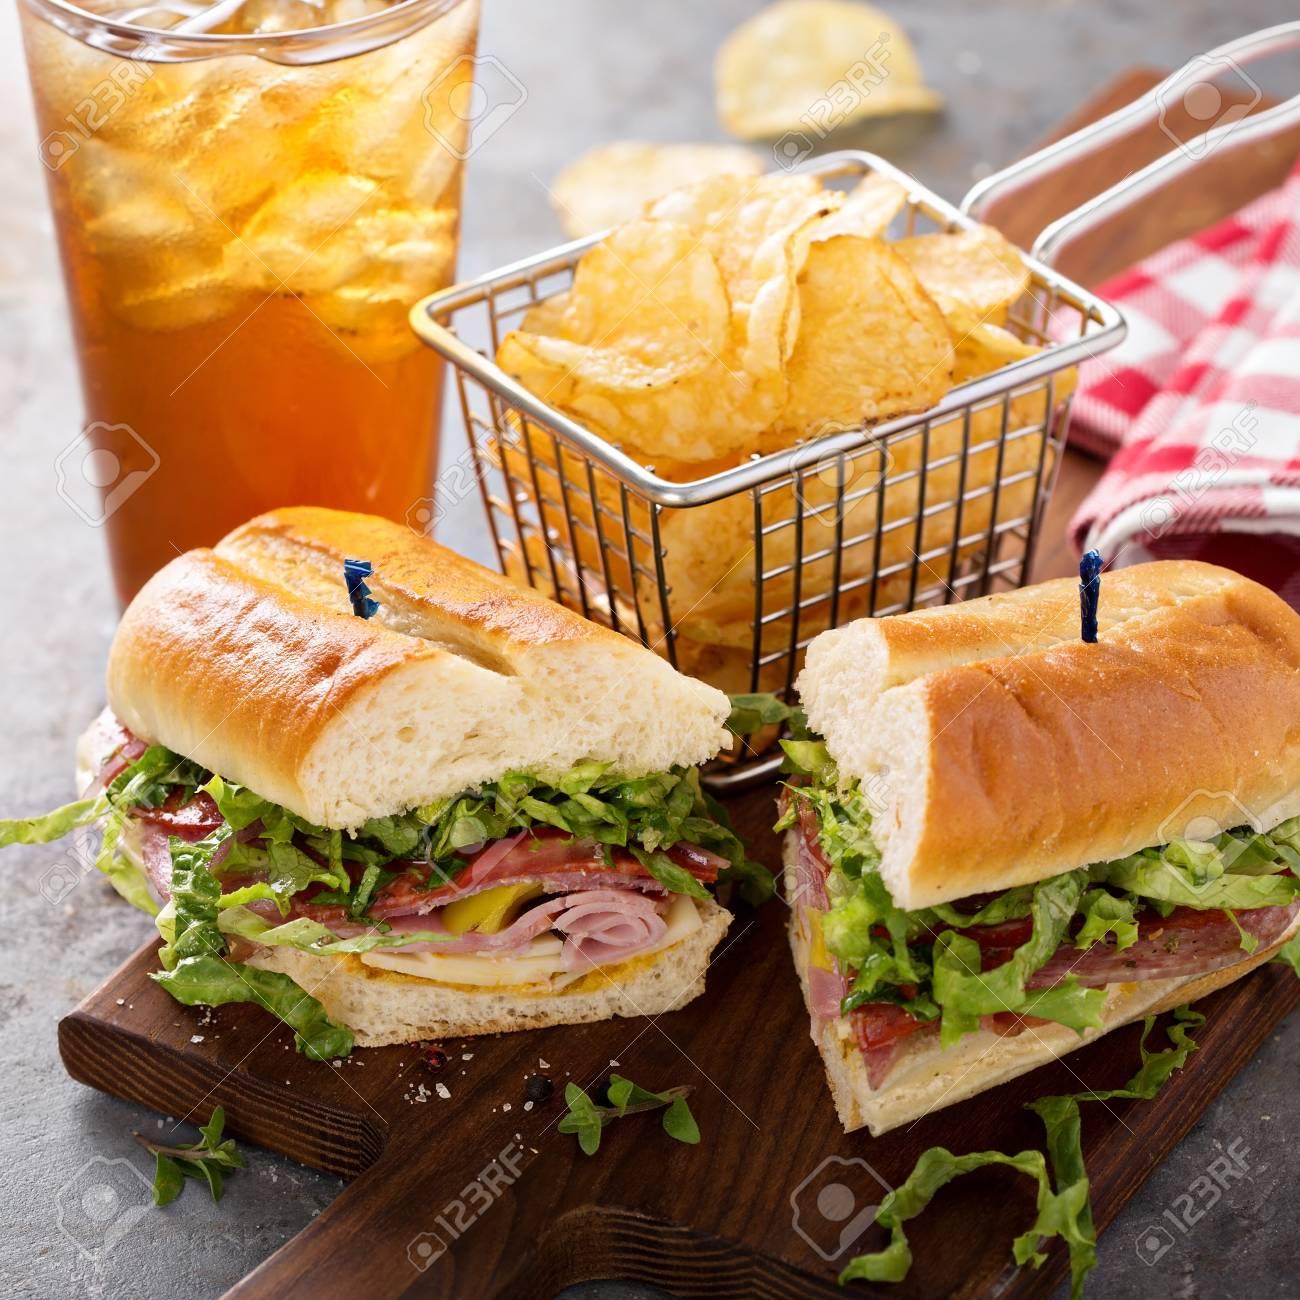 Italian sub sandwich with chips - 98985094